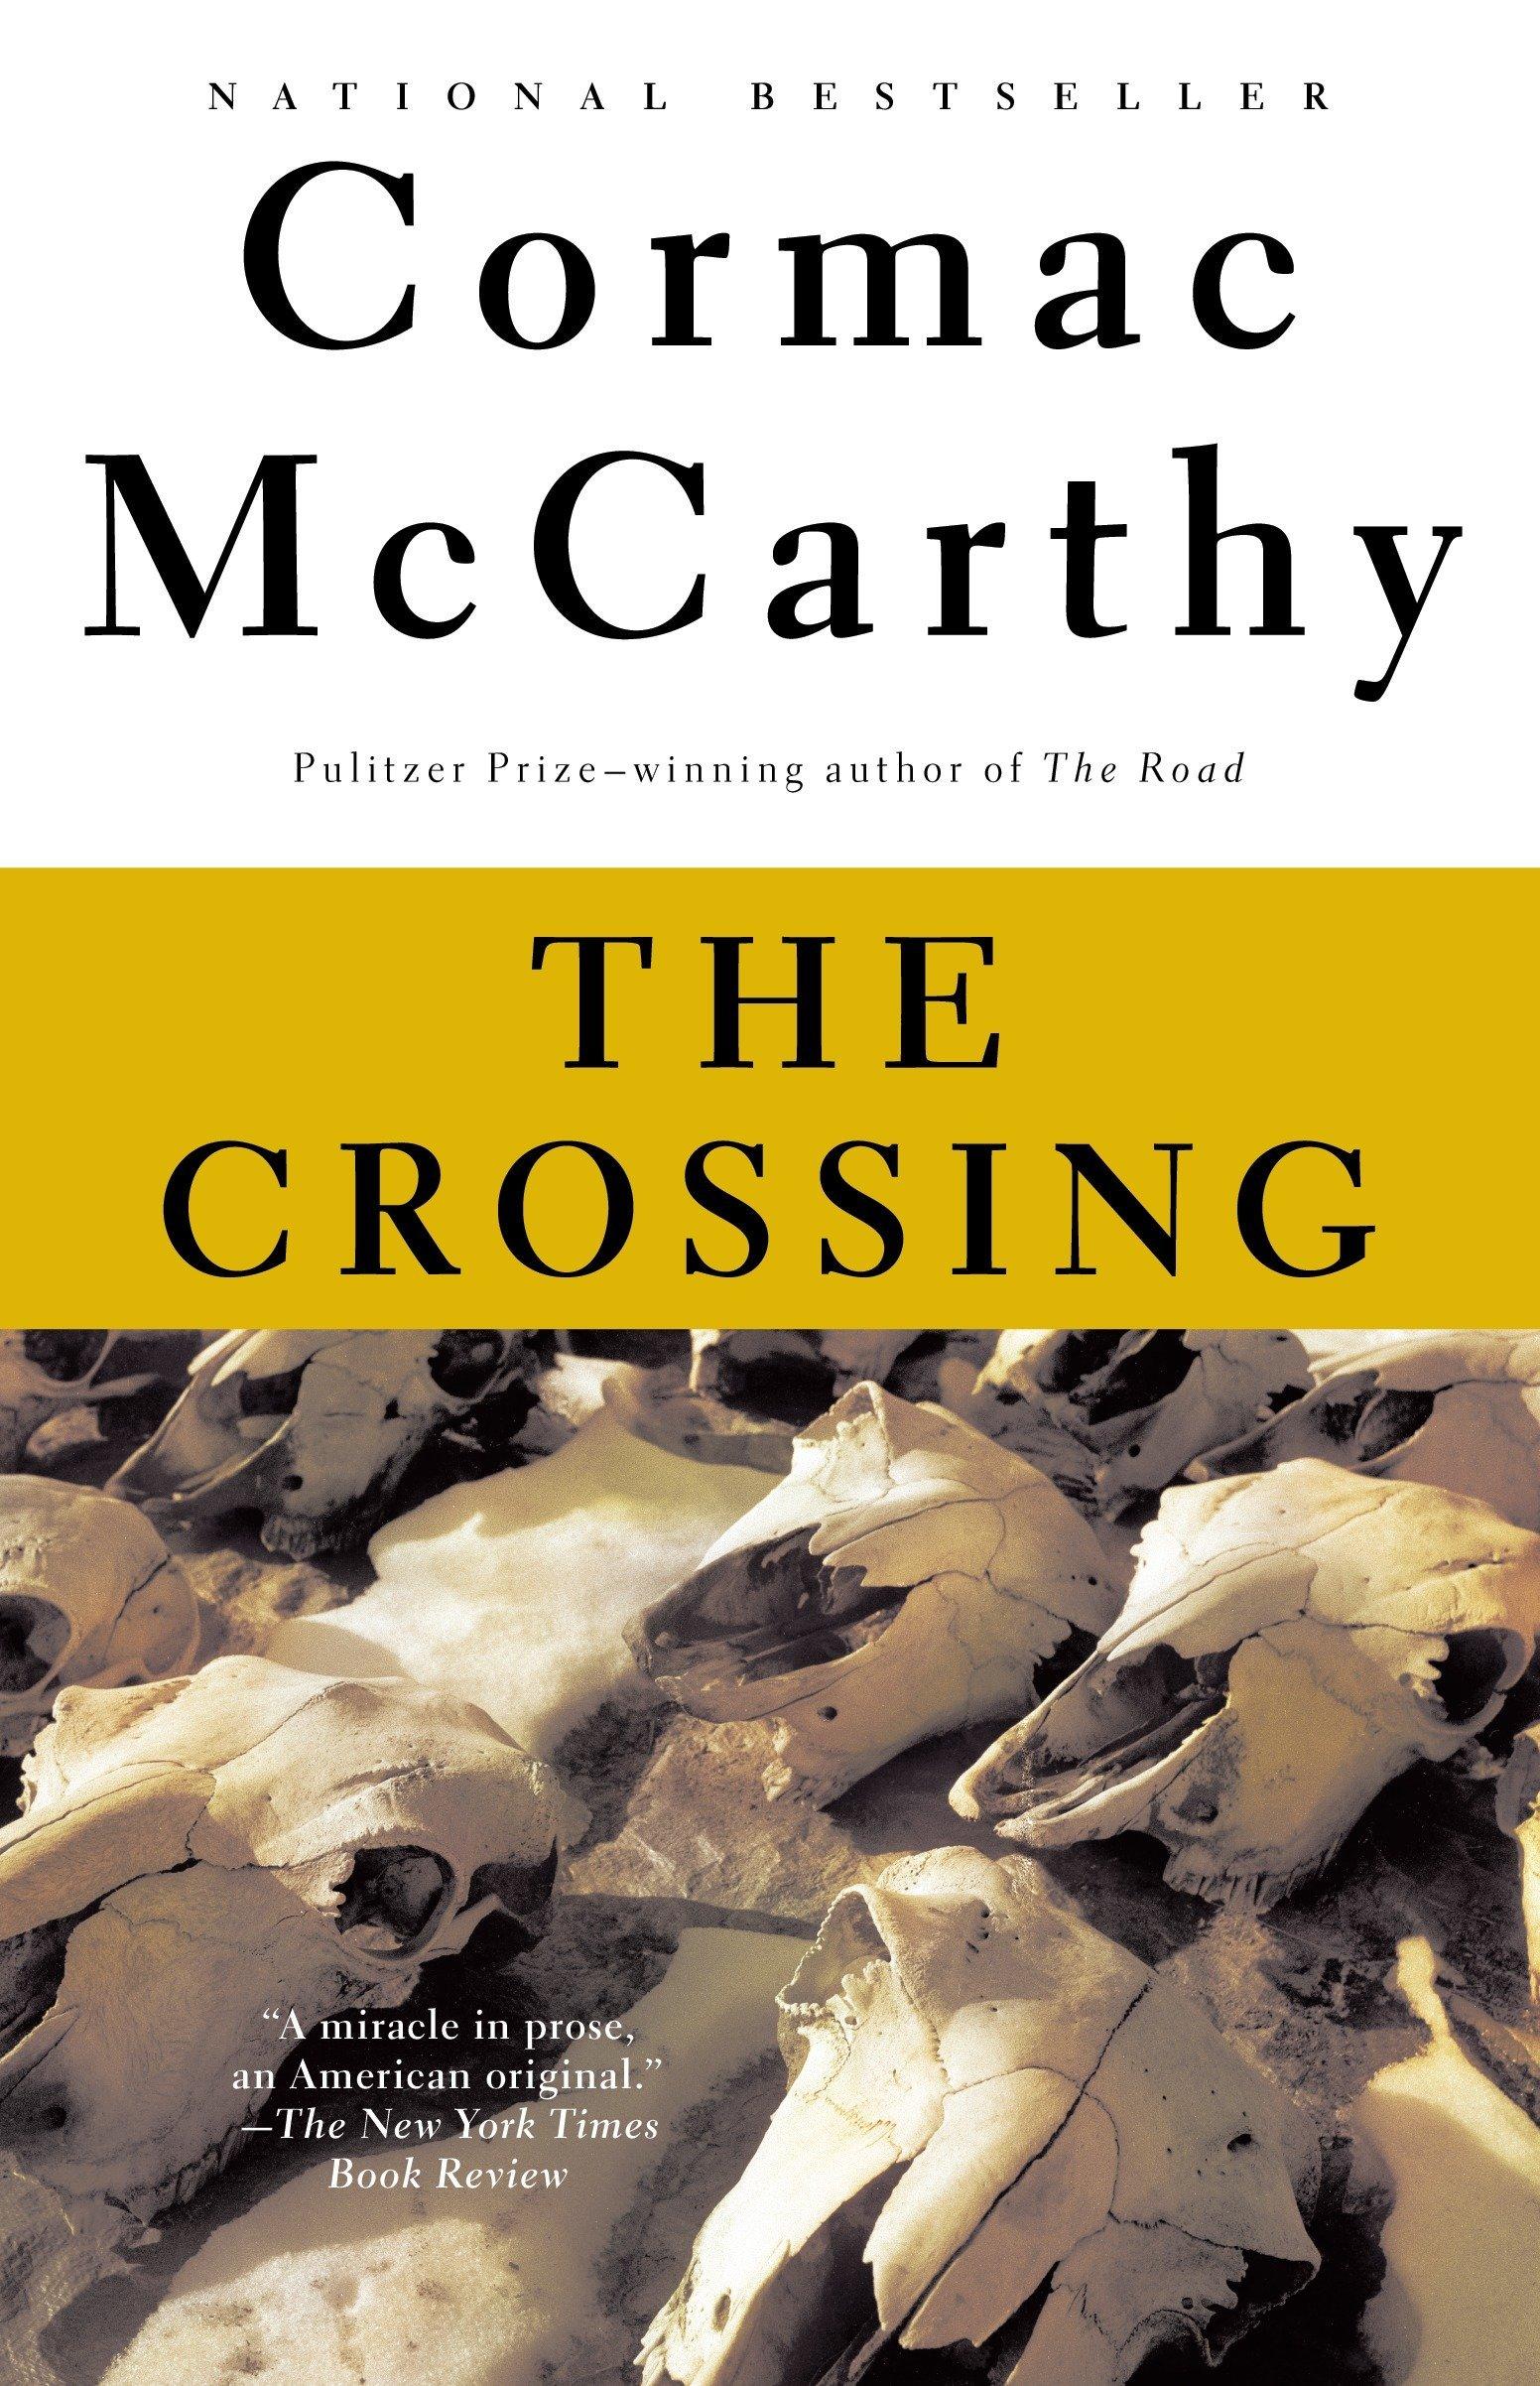 The Crossing_Cormac McCarthy